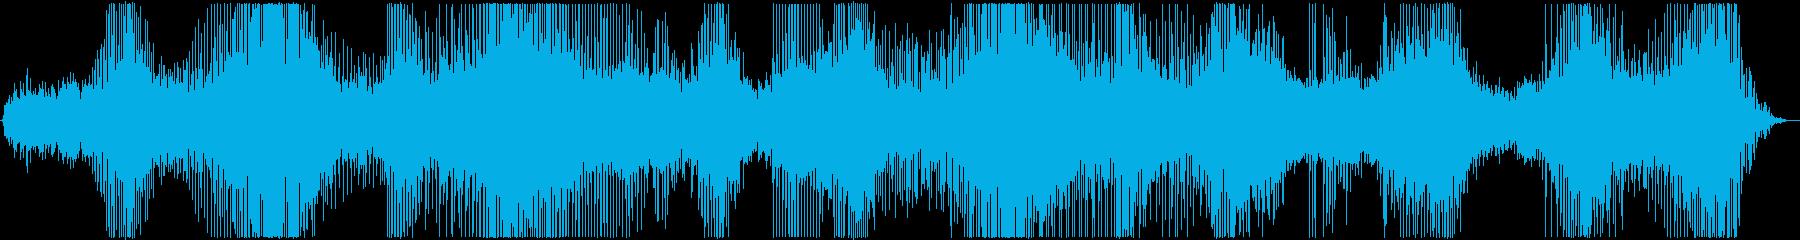 ATMO ABSTRACT Hel...の再生済みの波形